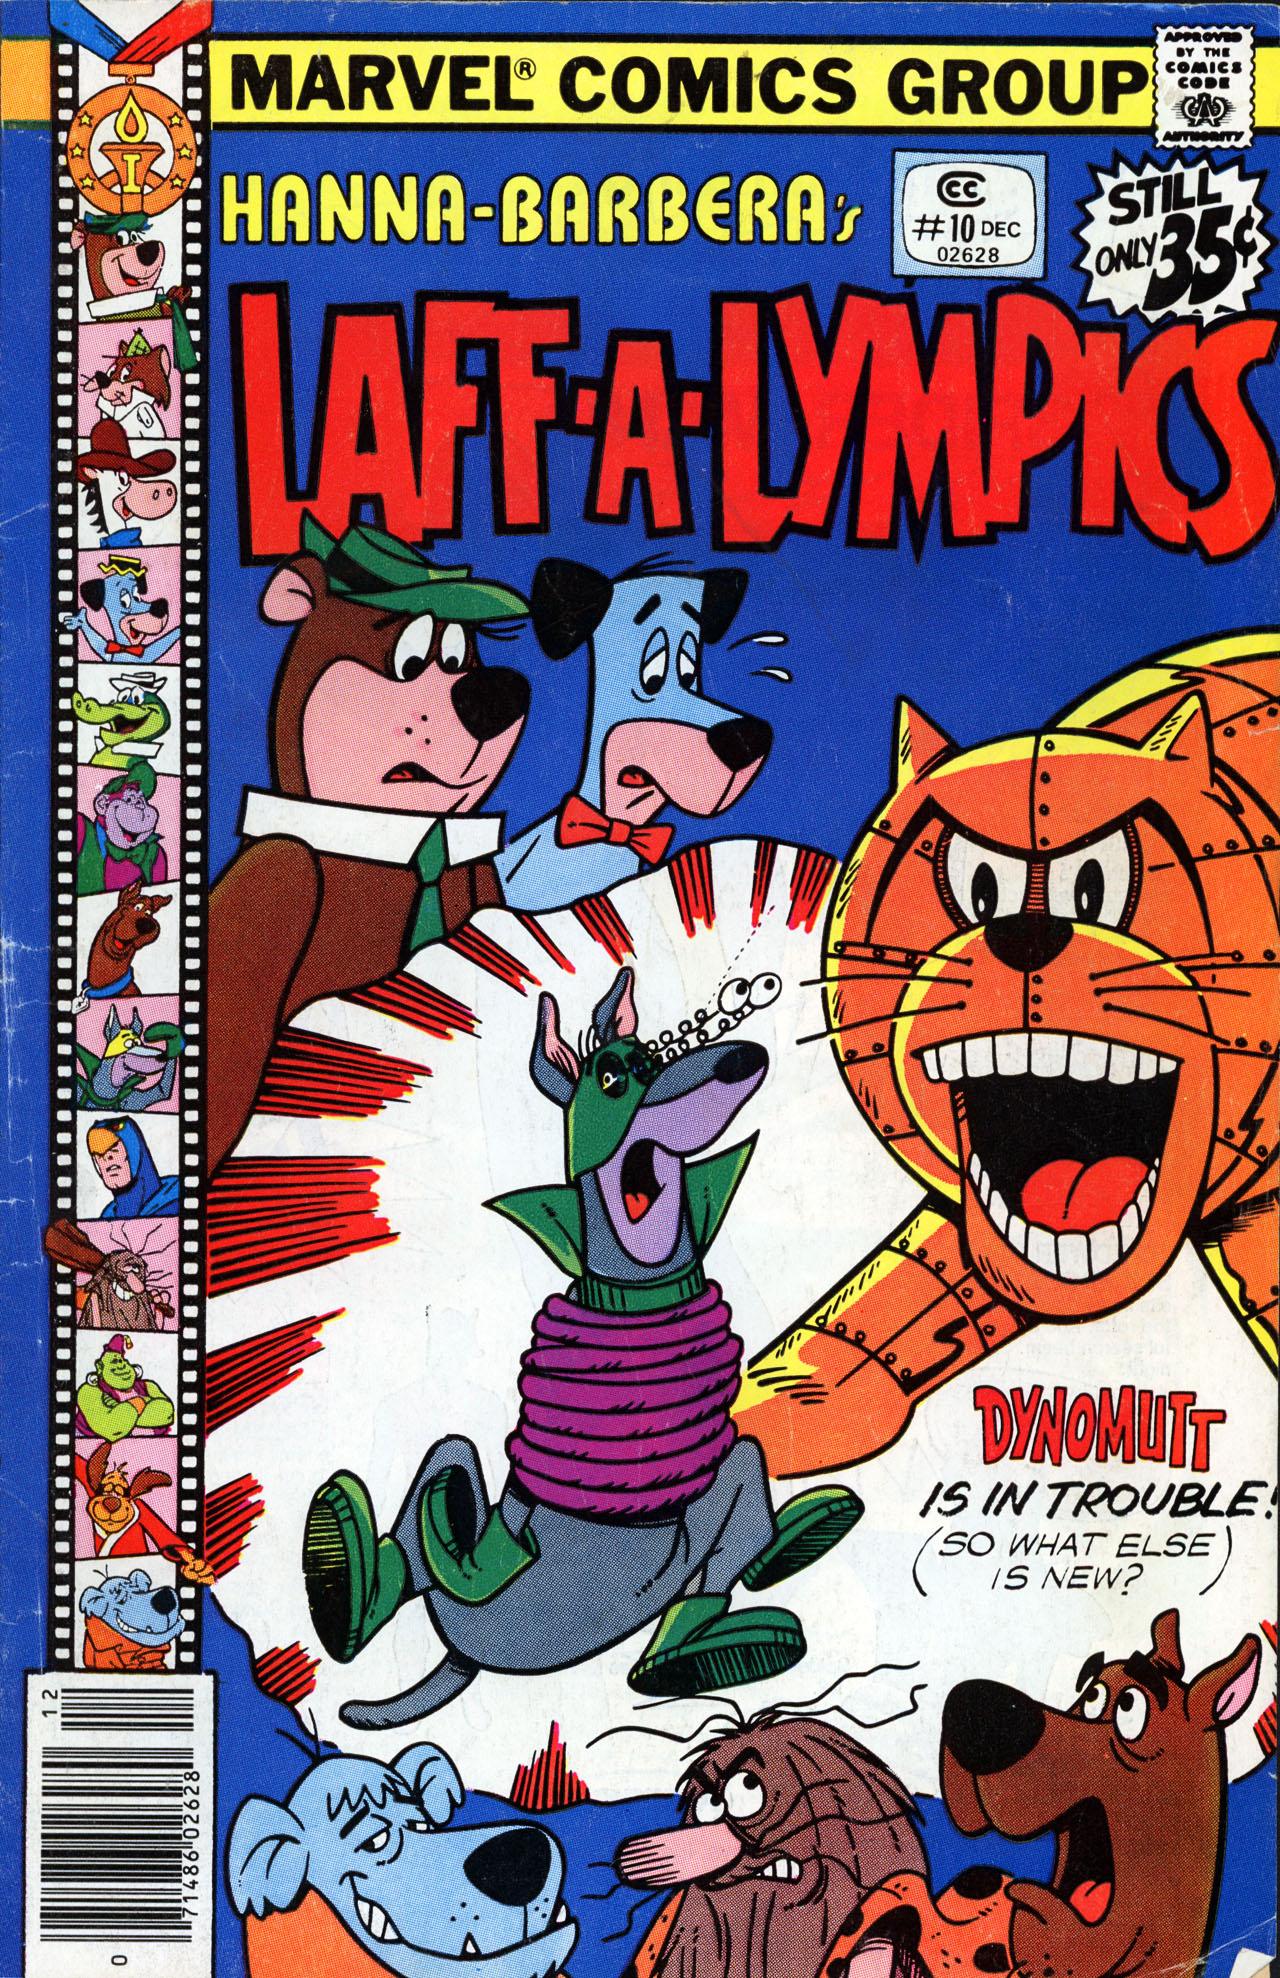 Laff-a-lympics 10 Page 1